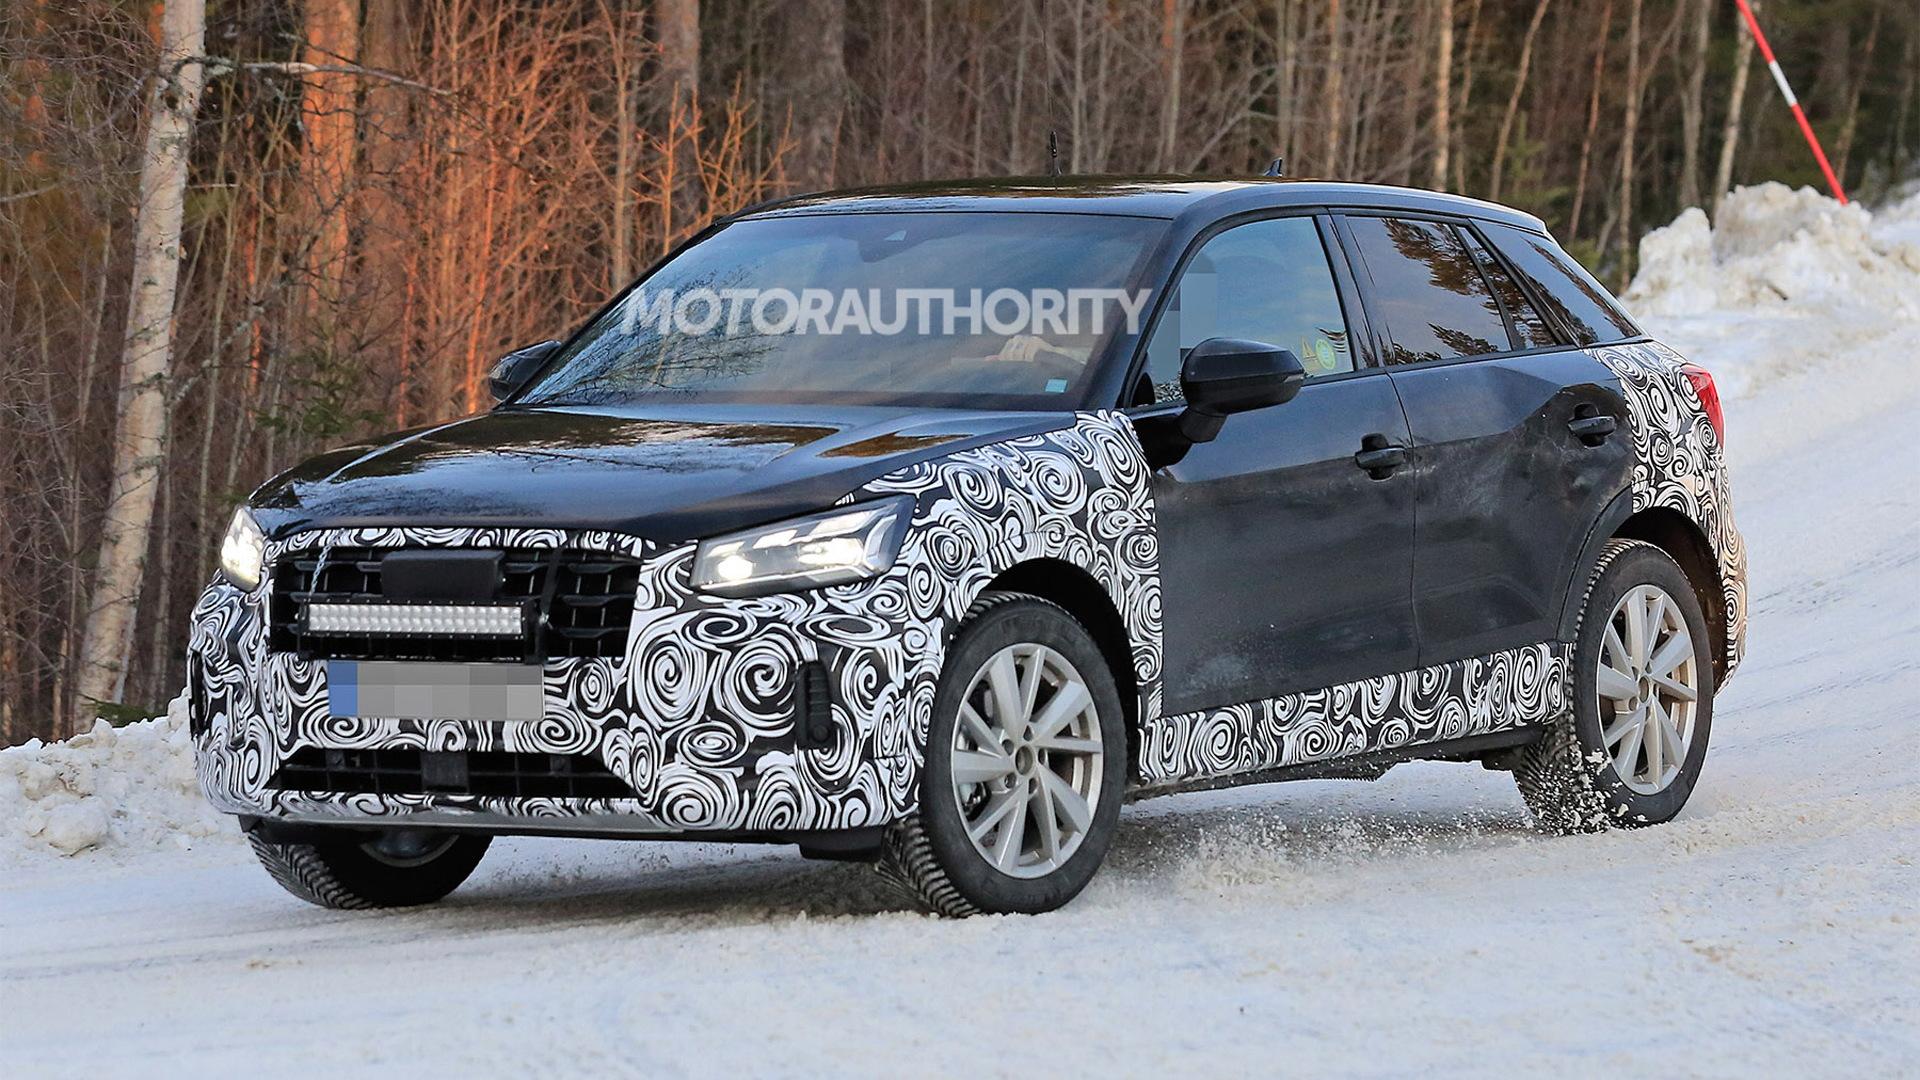 2020 Audi Q2 facelift spy shots - Photo credit: S. Baldauf/SB-Medien